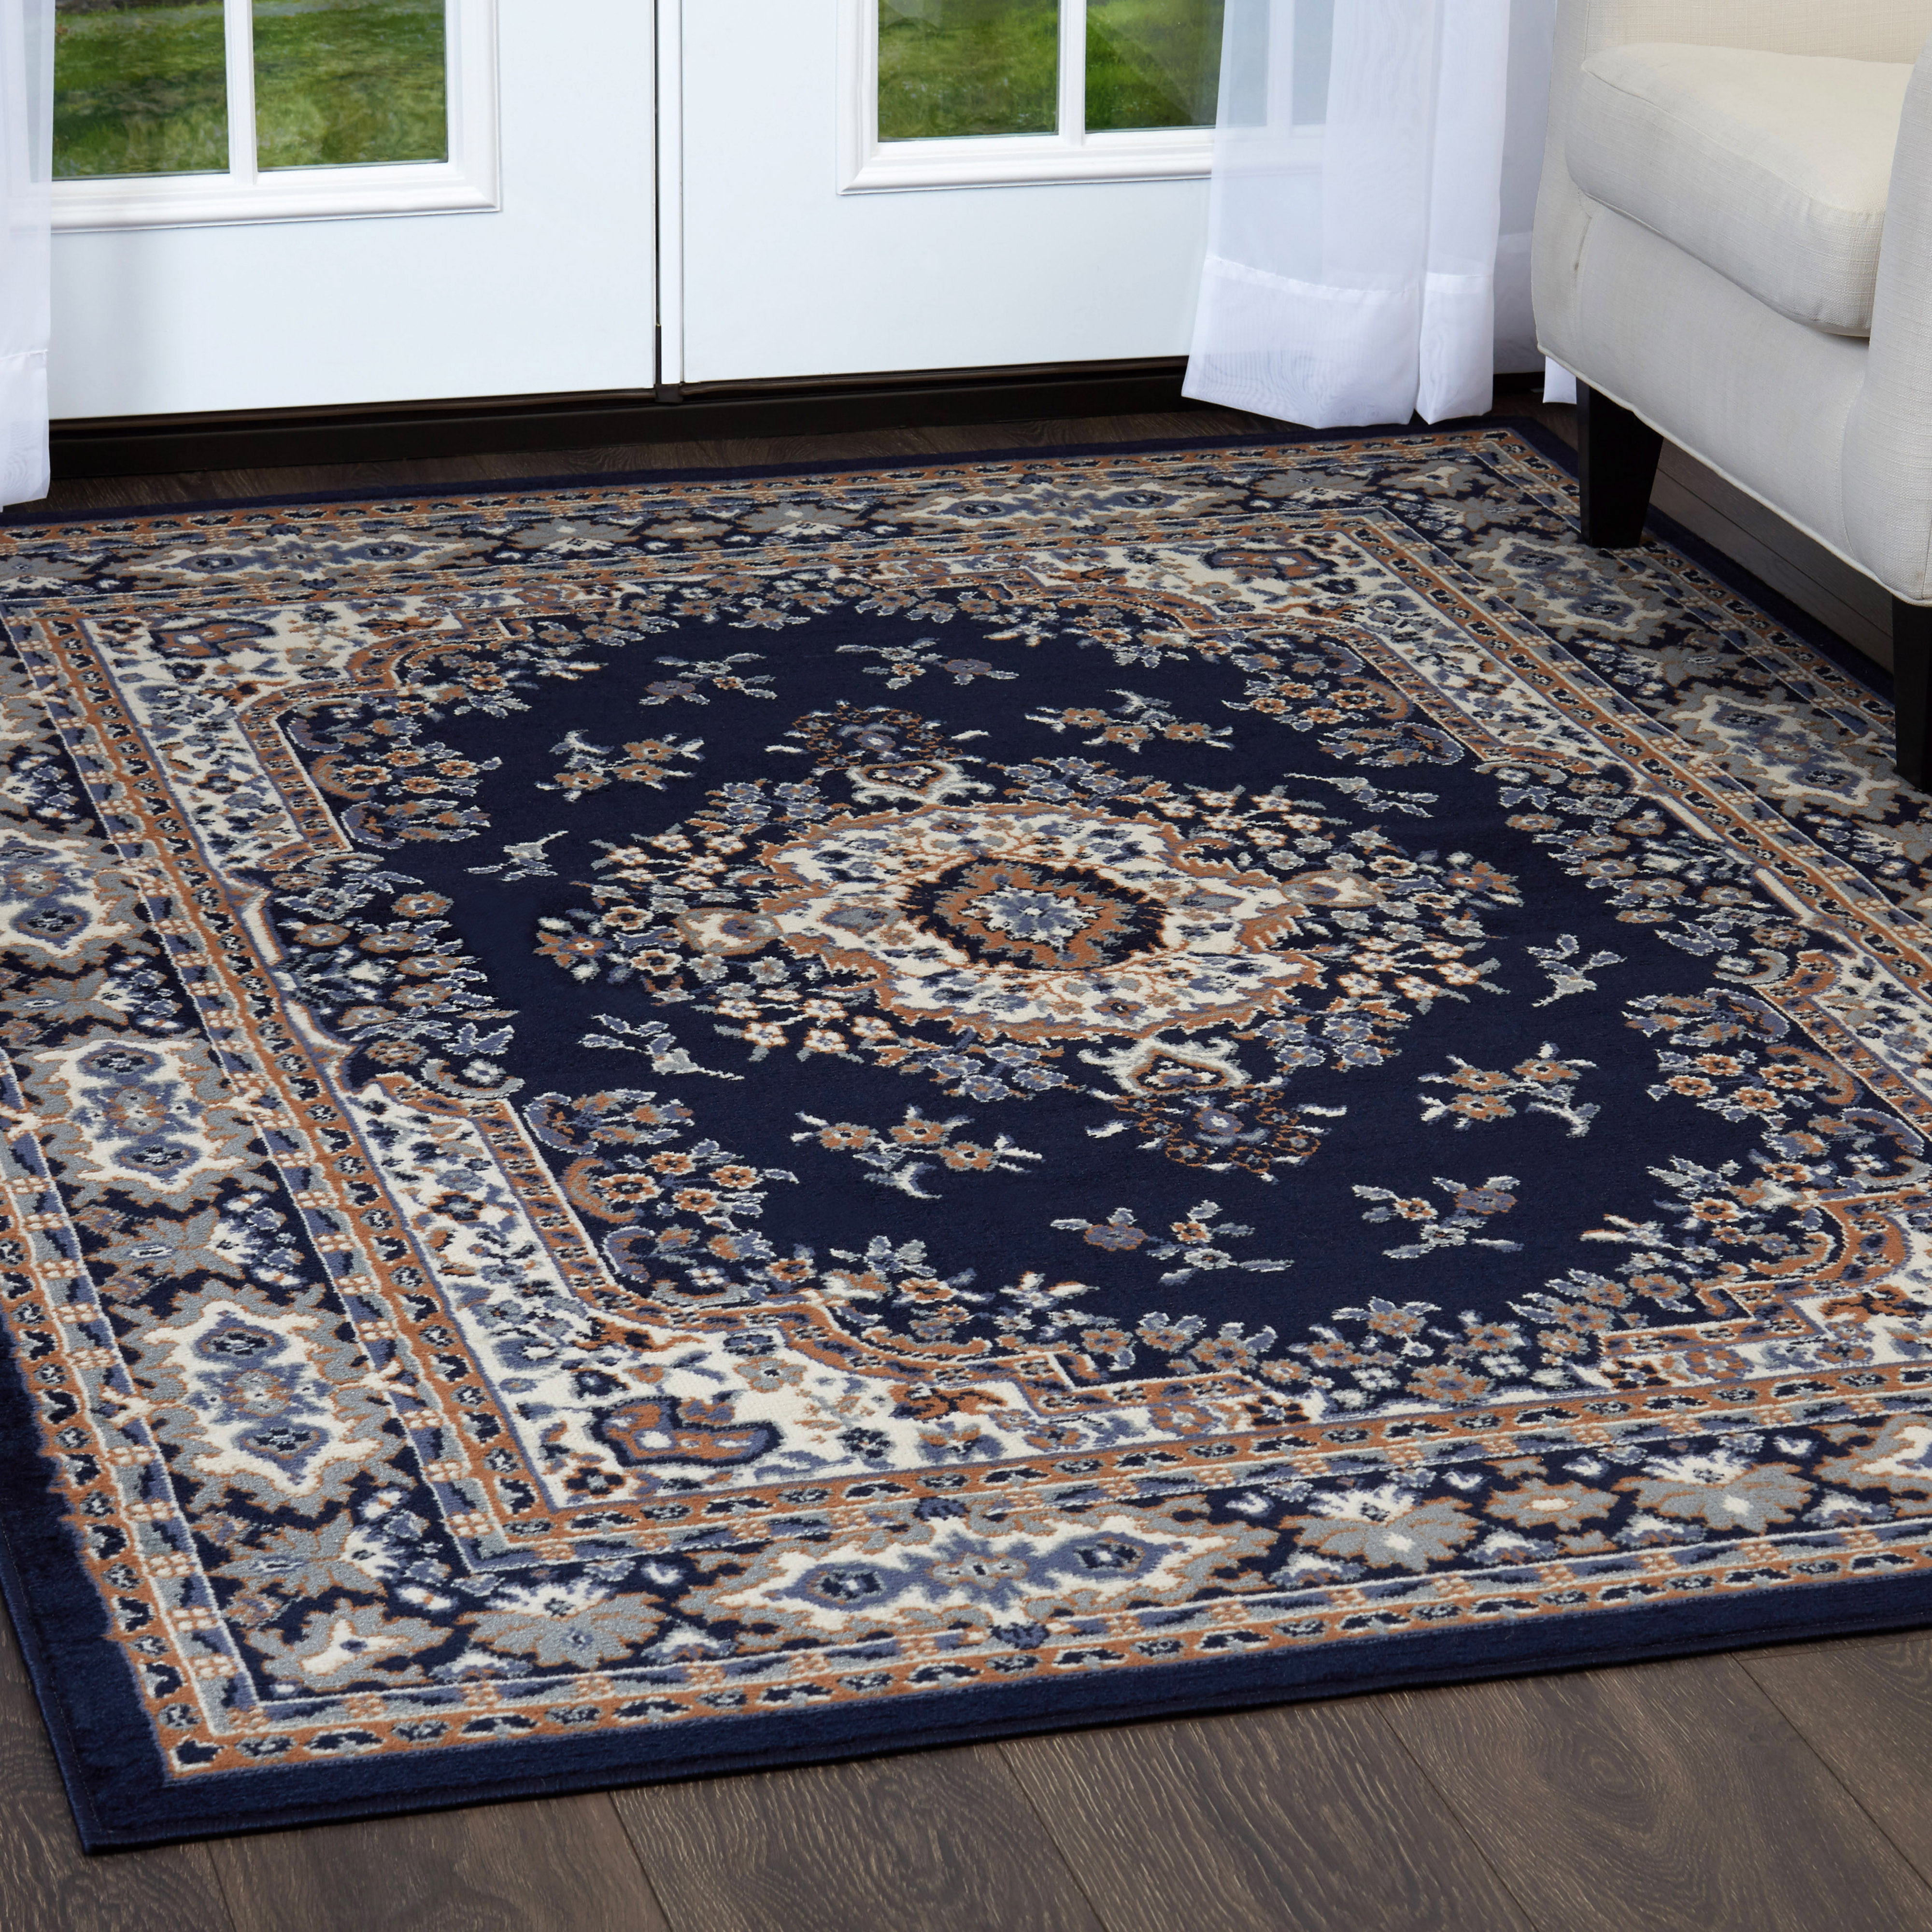 home dynamix premium collection 7069-103 area rug - walmart